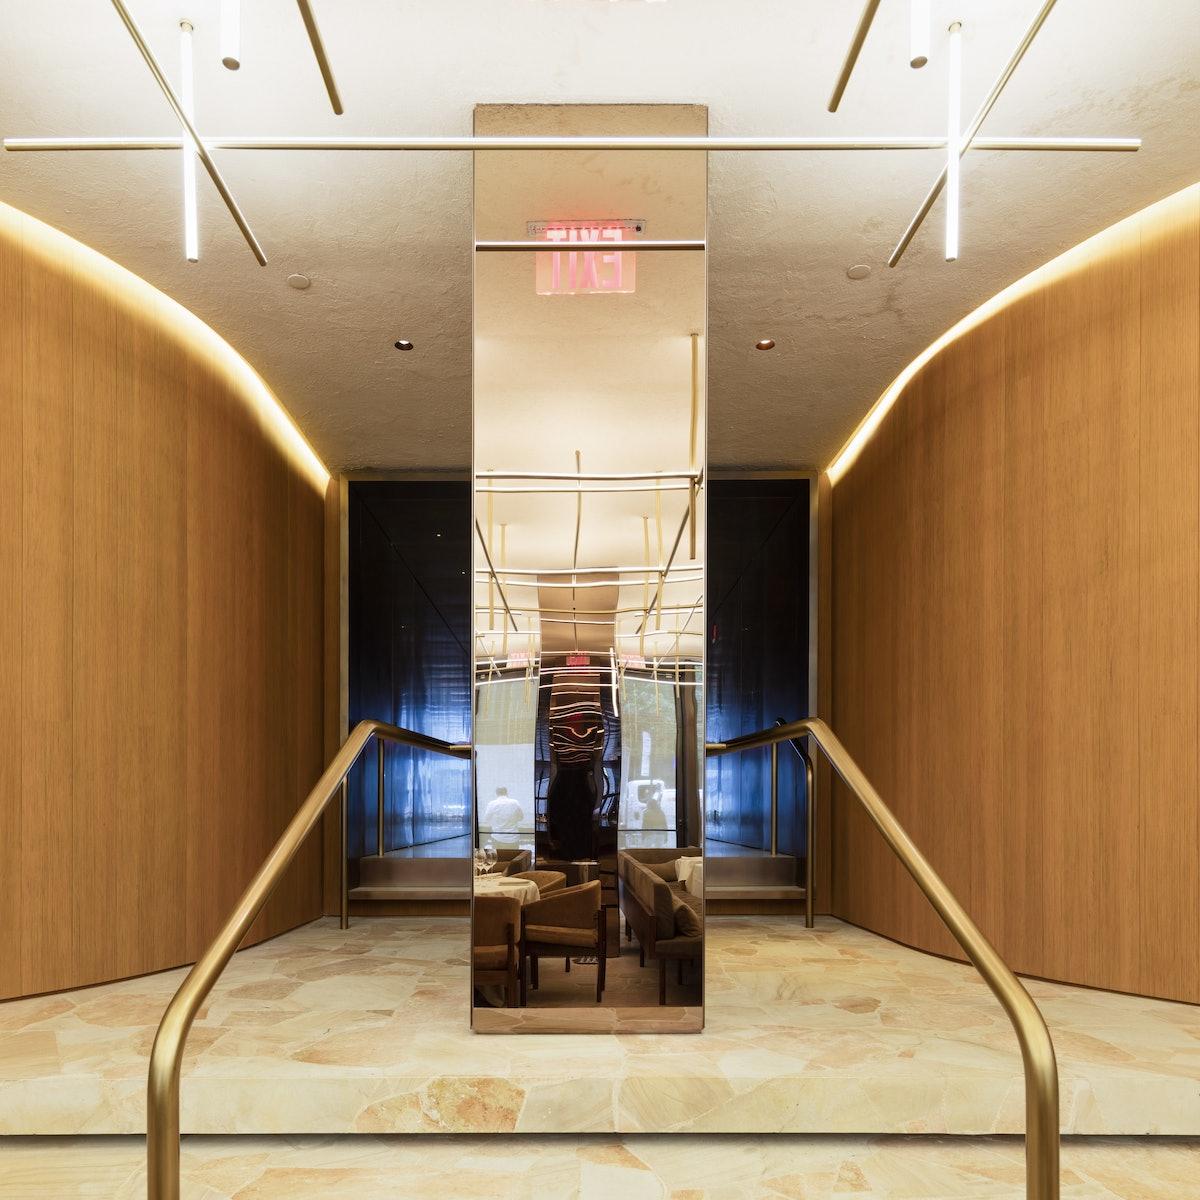 The Four Seasons_Dining Room Entrance_Fernando Guerra.JPG